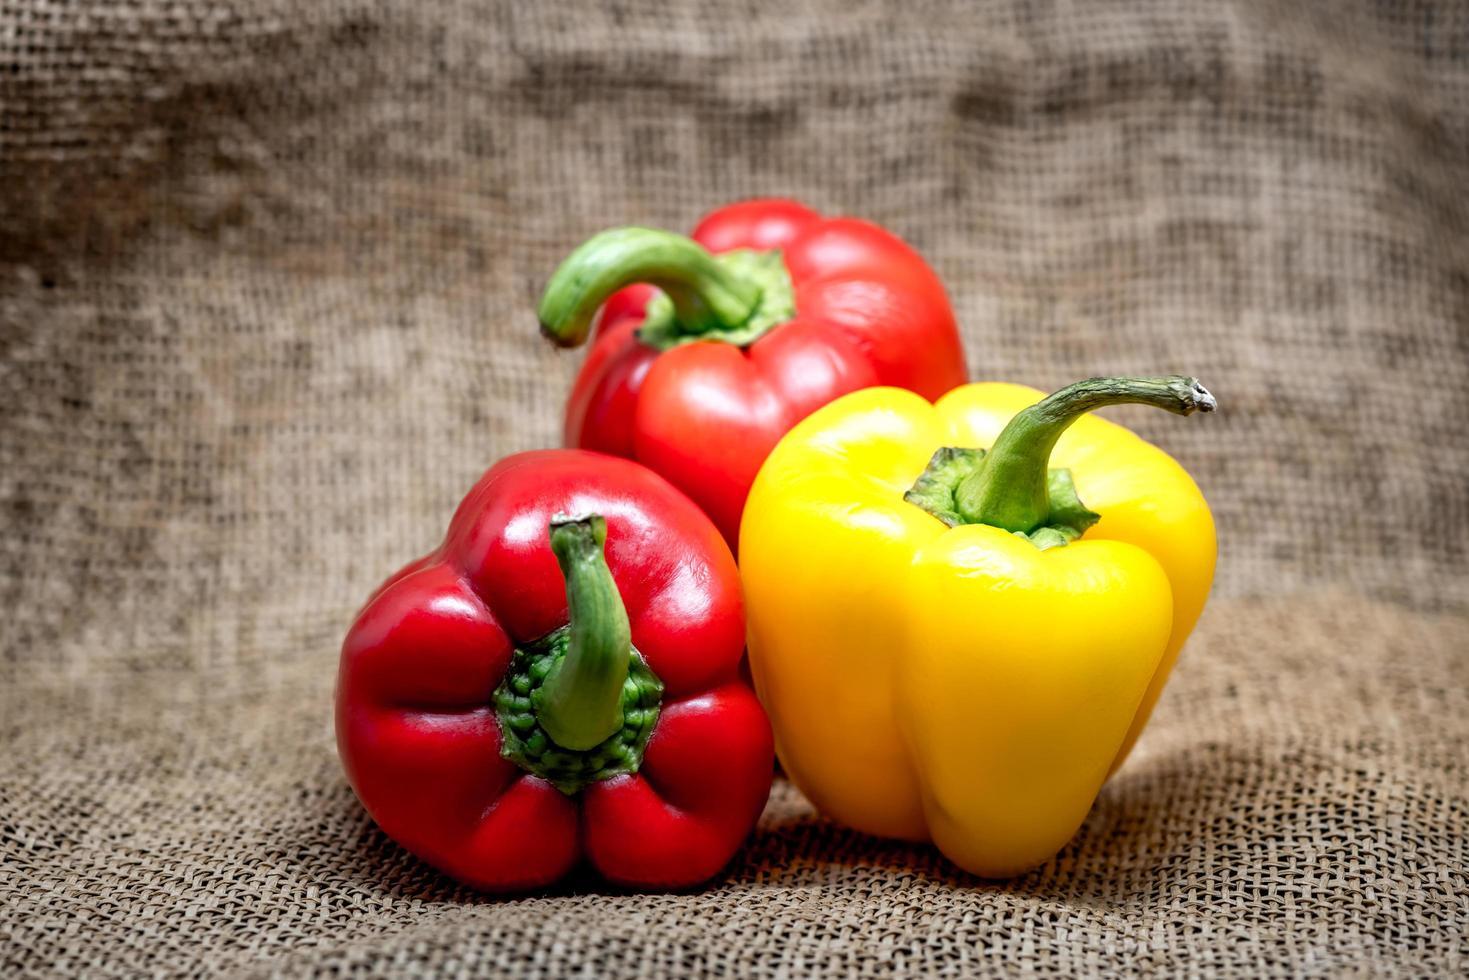 olika färgade paprika foto